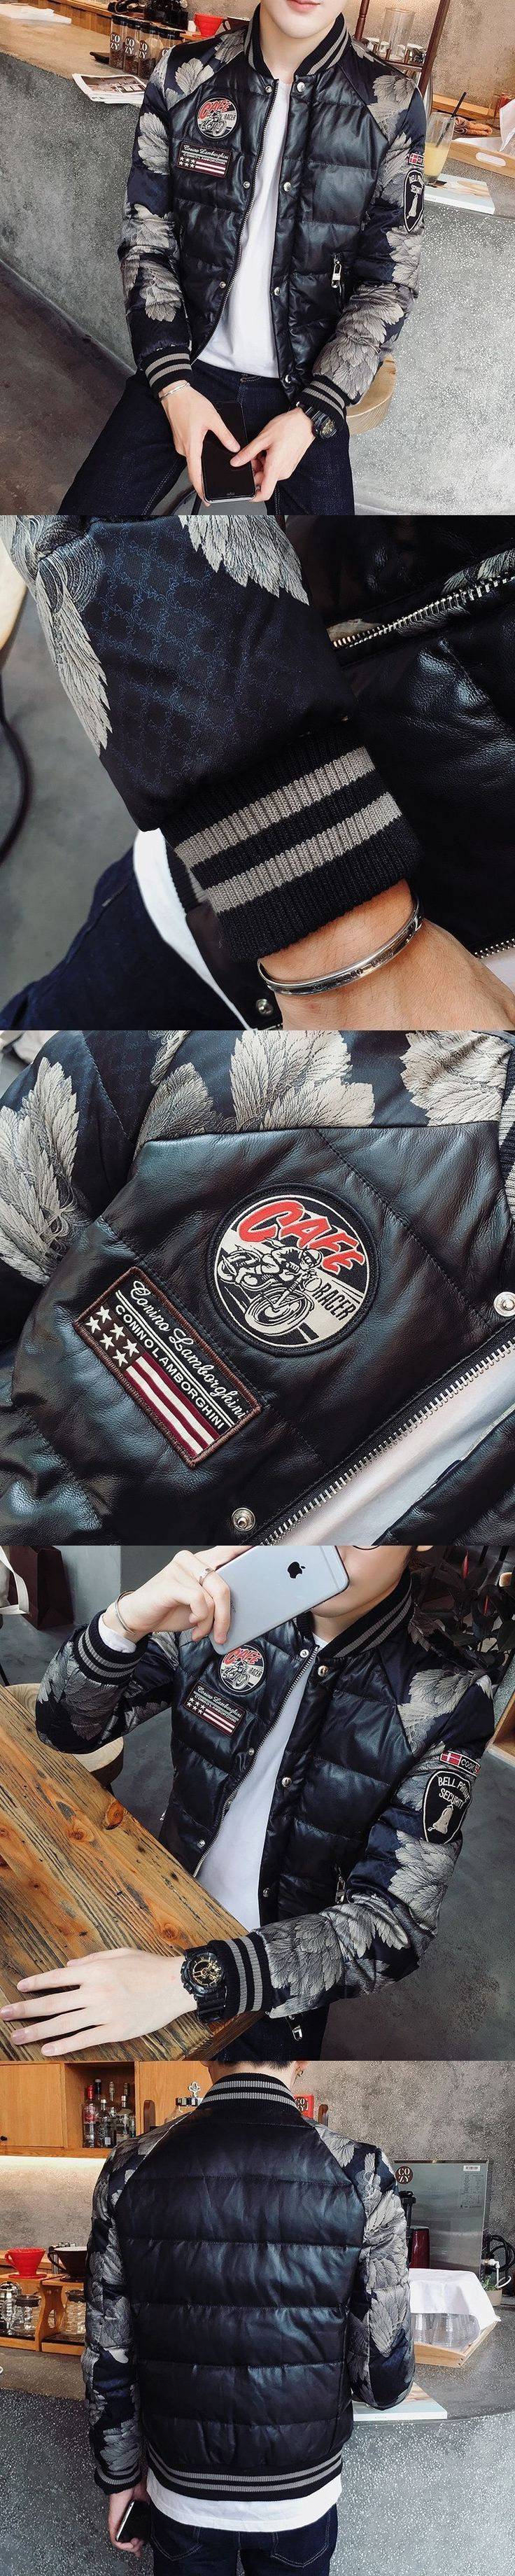 Thick Winter Printed Jacket Parka Men  Winter Men Puffer Overcoat Men Black Mens Fashion Coat Club Outfit 3xl Slim Fit #parkaoutfit #cluboutfits #menoutfits #men'sfitness